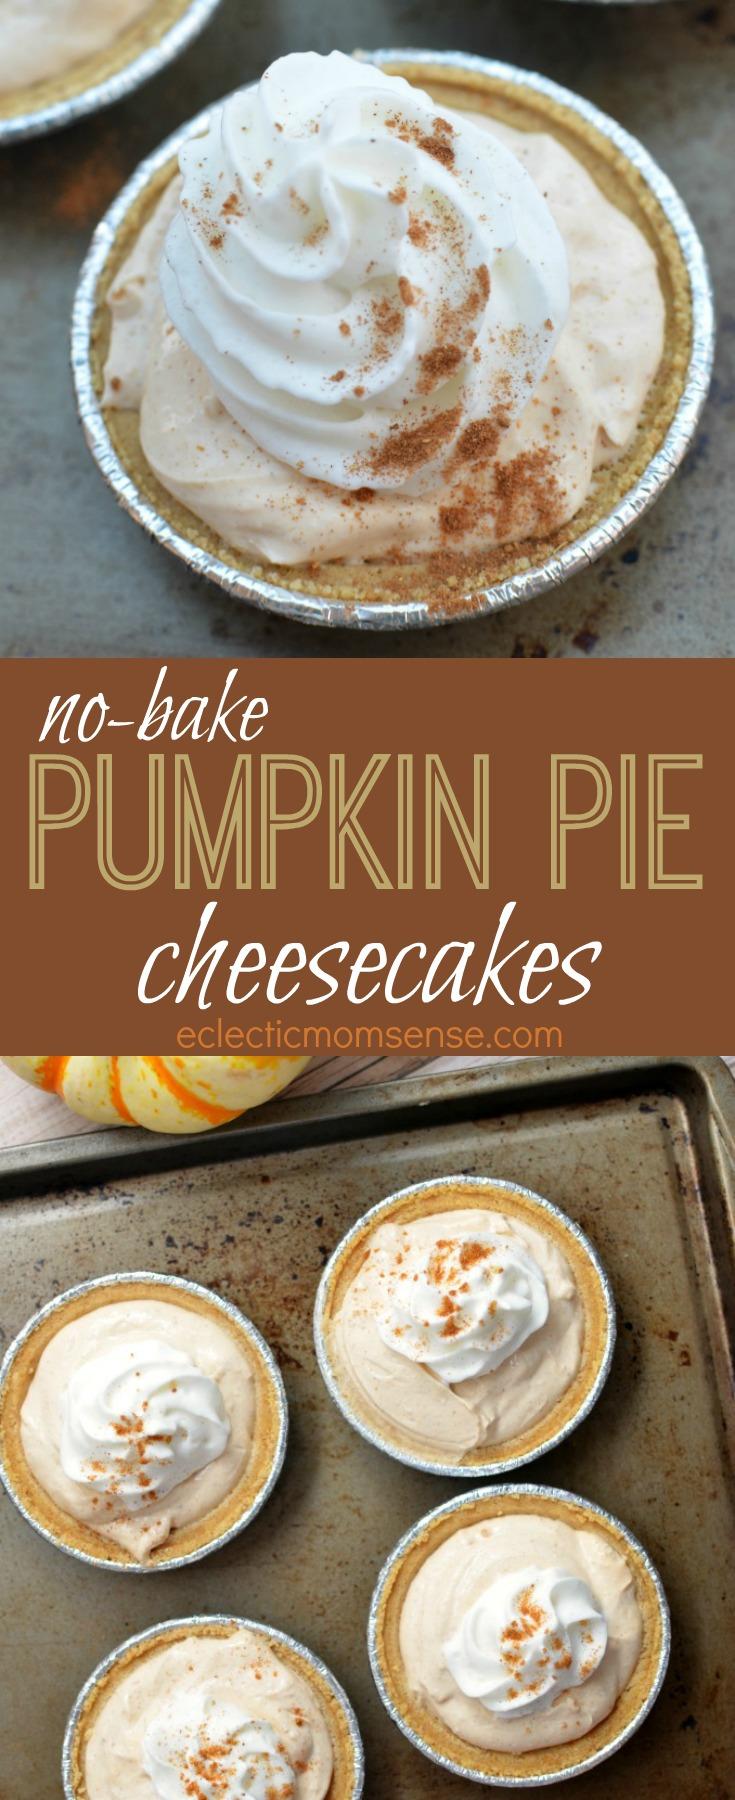 no-bake Pumpkin Pie Cheesecakes